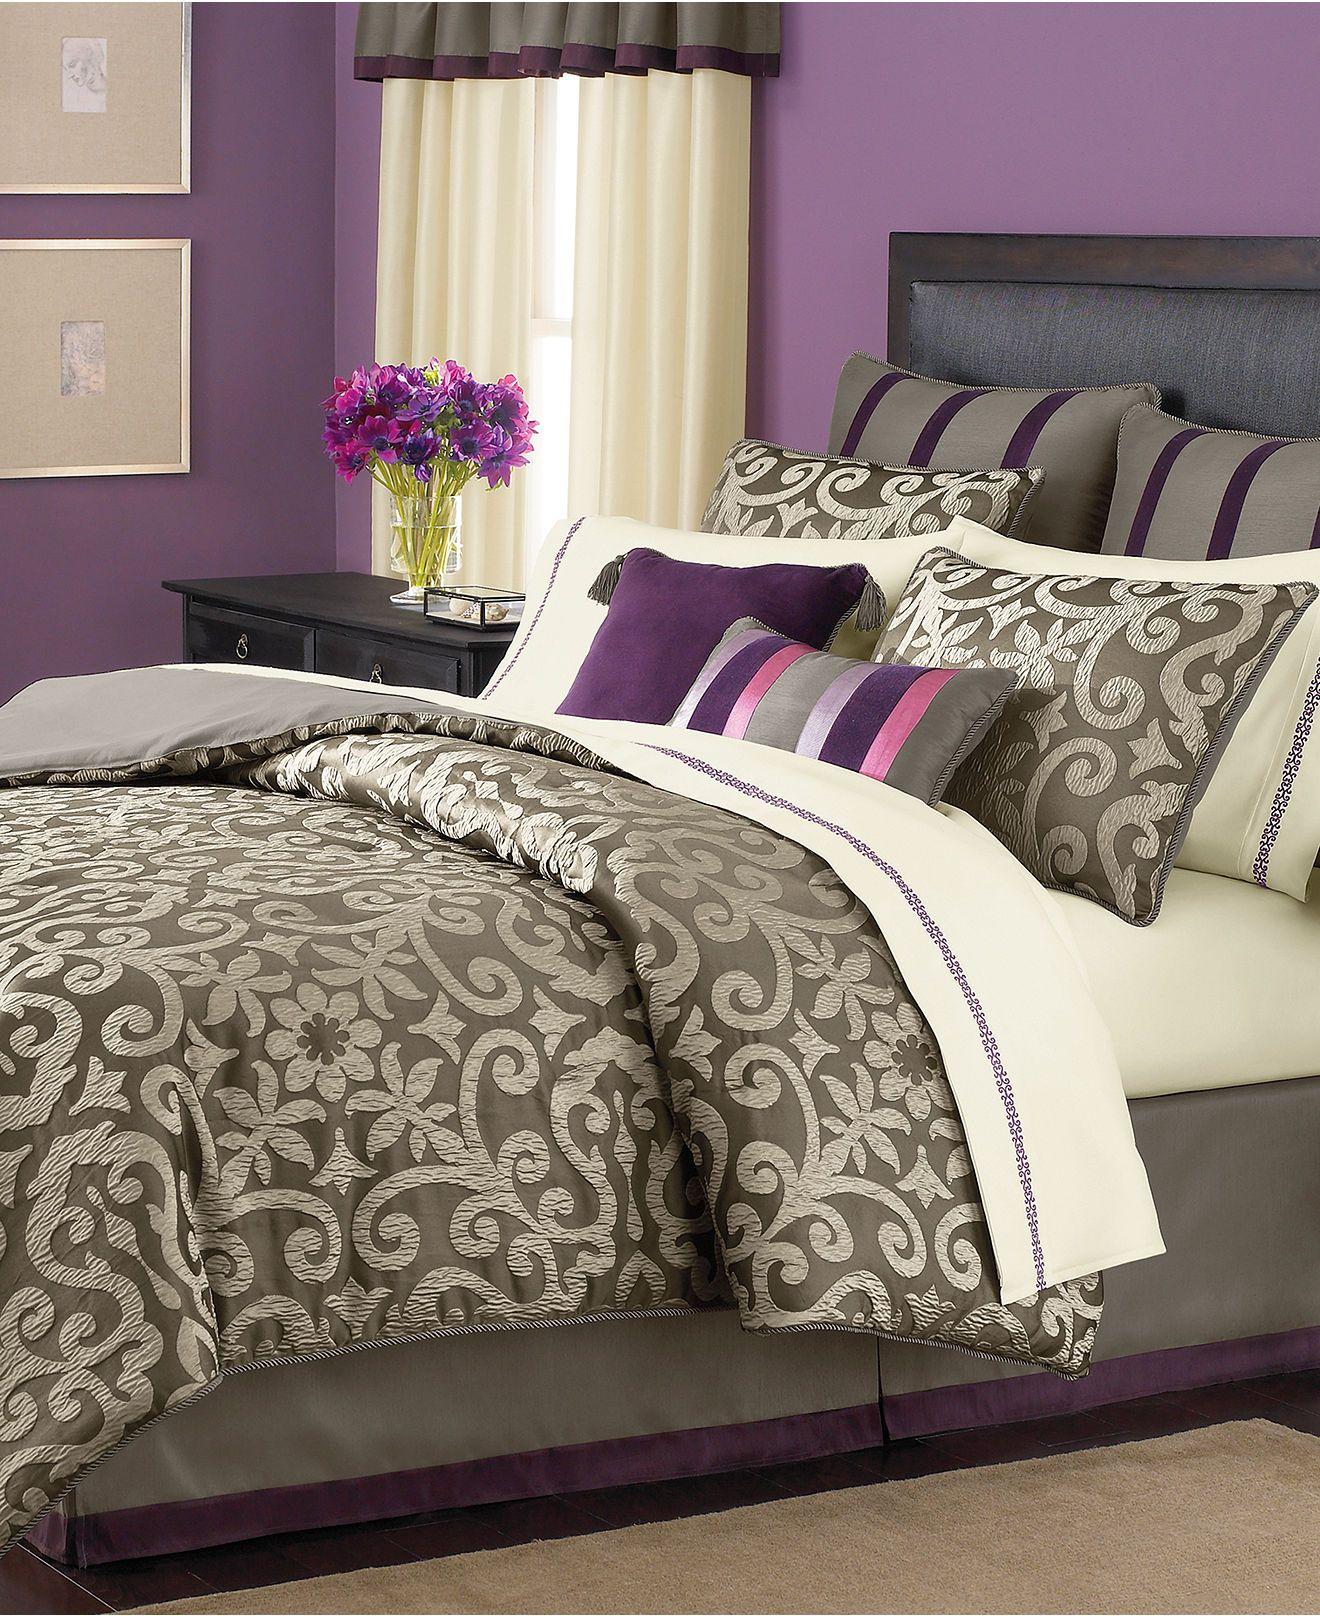 Arrangement Of Bedroom Bedroom Ideas Violet Best Bedroom Chairs Victorian Bedroom Ceiling Light: I Have A Lighter Version Of Purple Walls In Our Bedroom